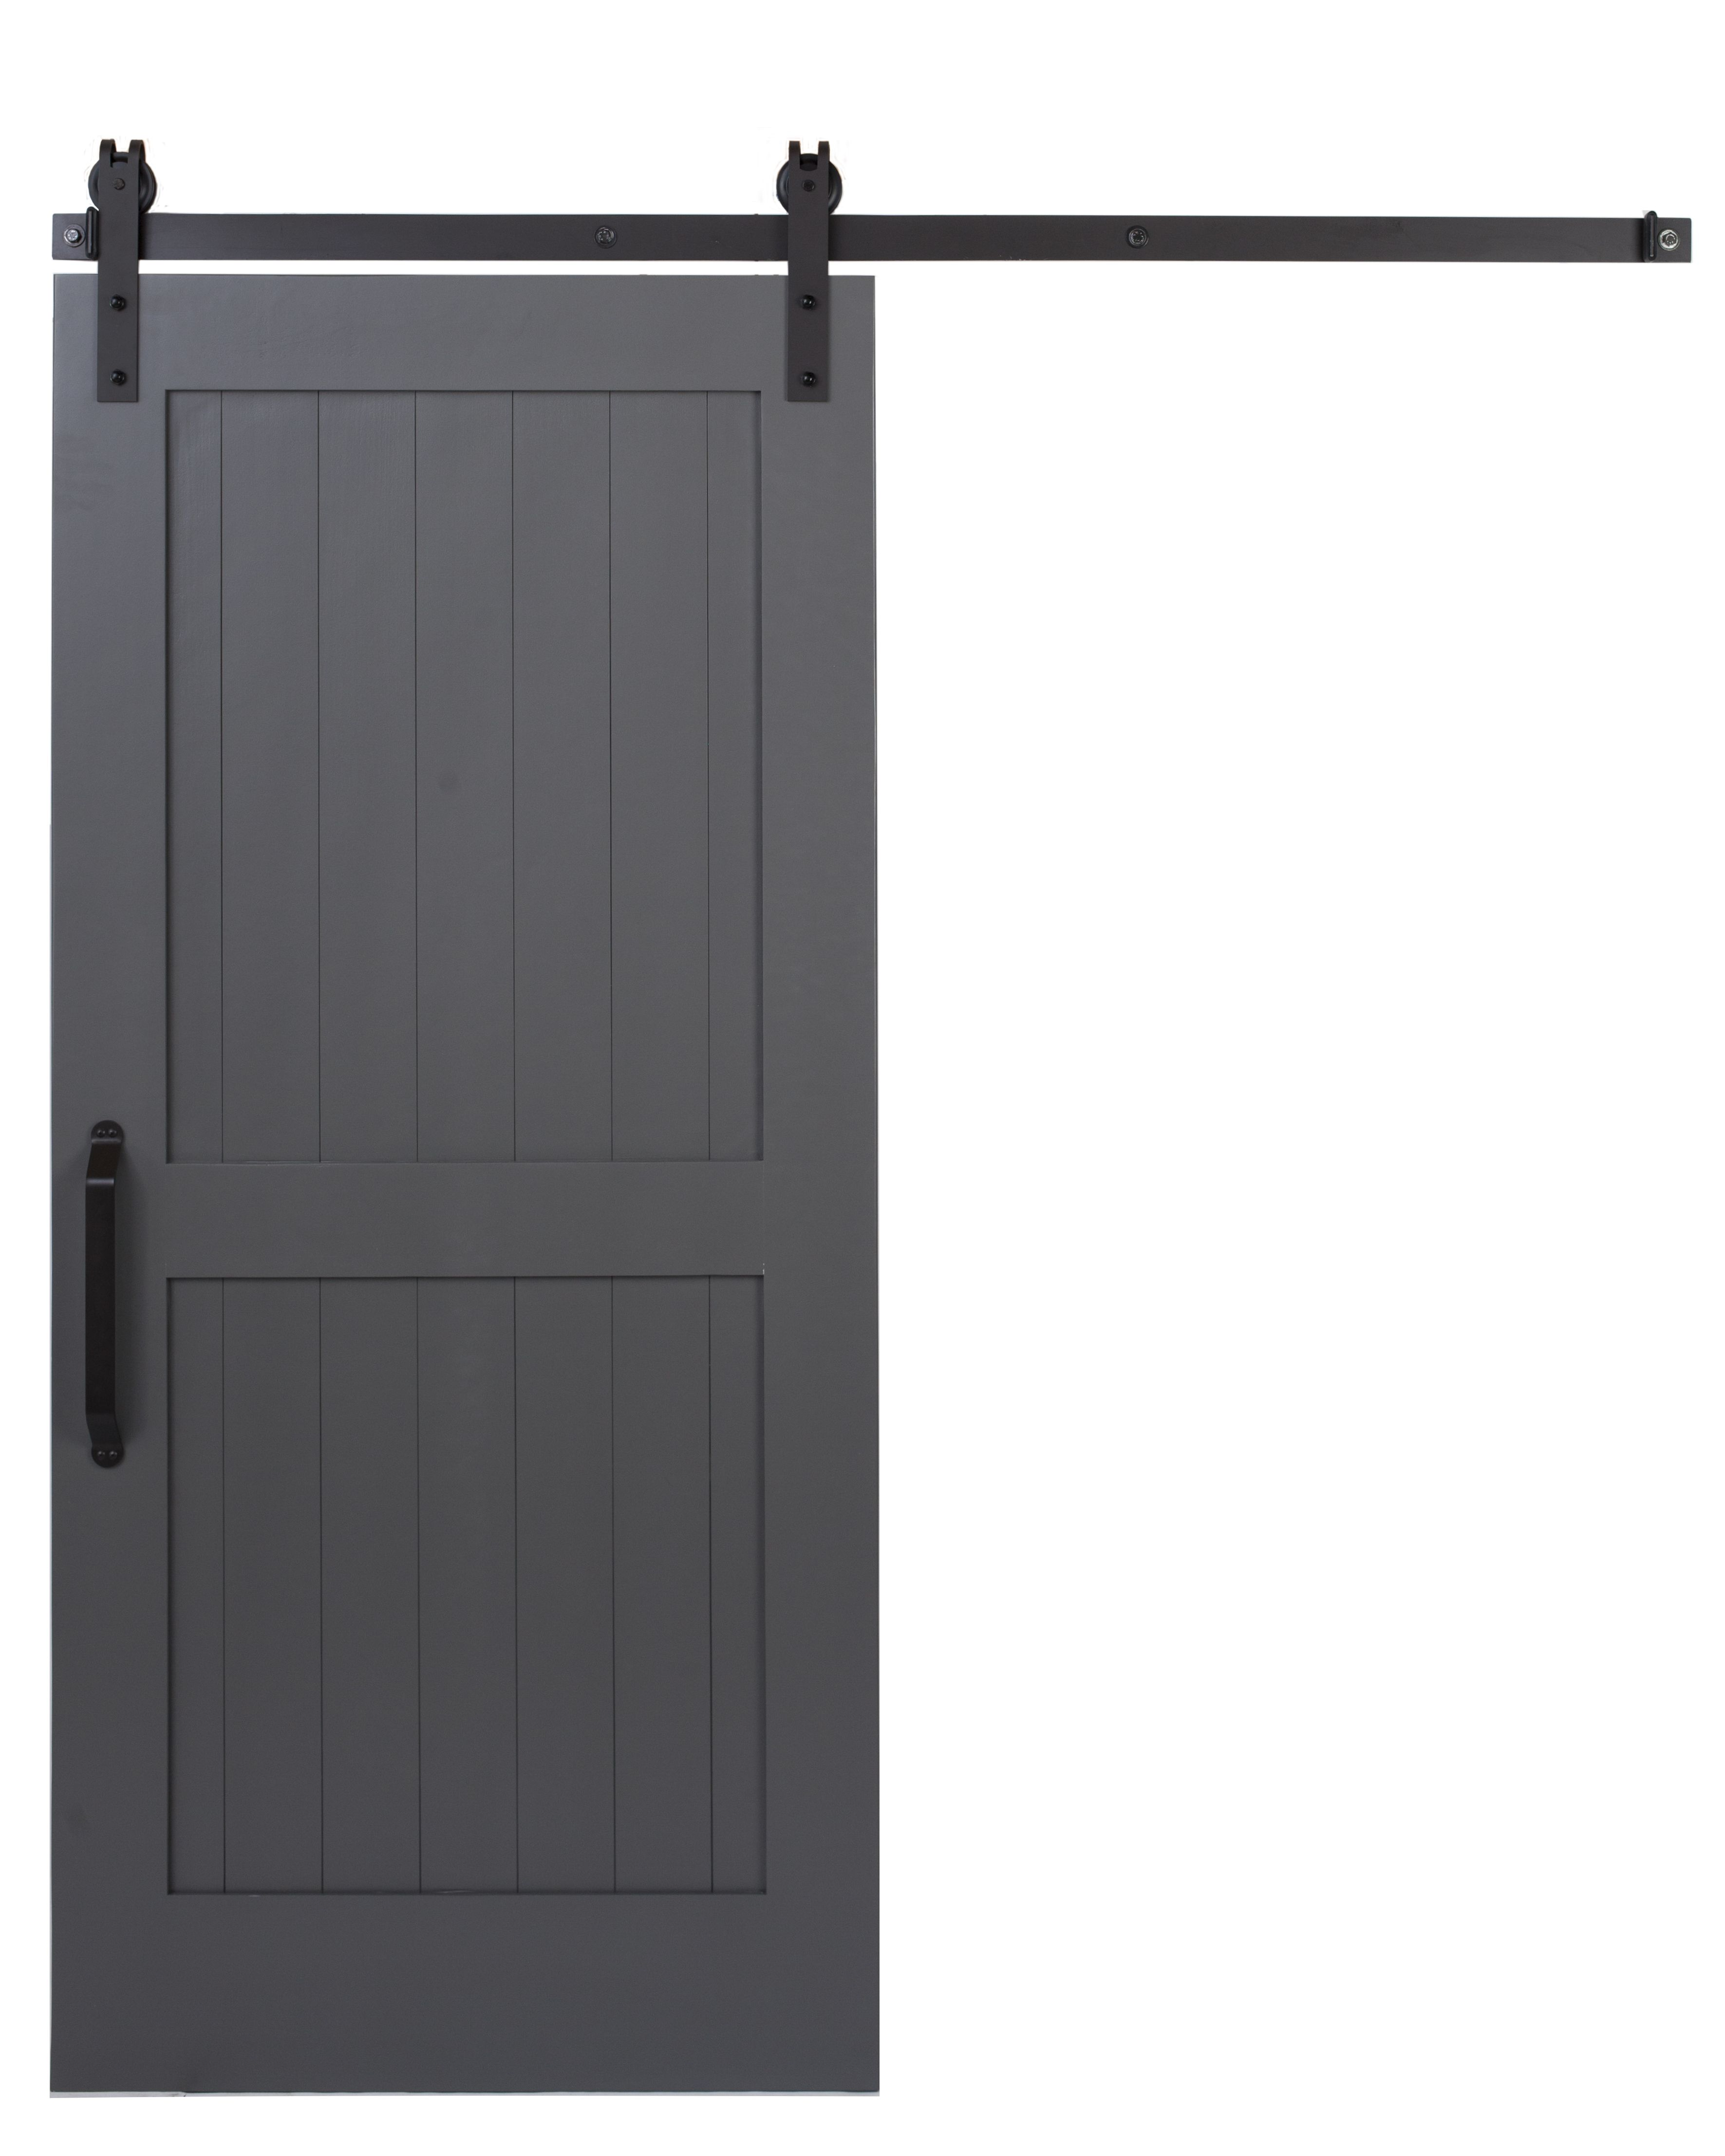 zen barn the master closet pin hardware cs interior bathroom sliding kits on door